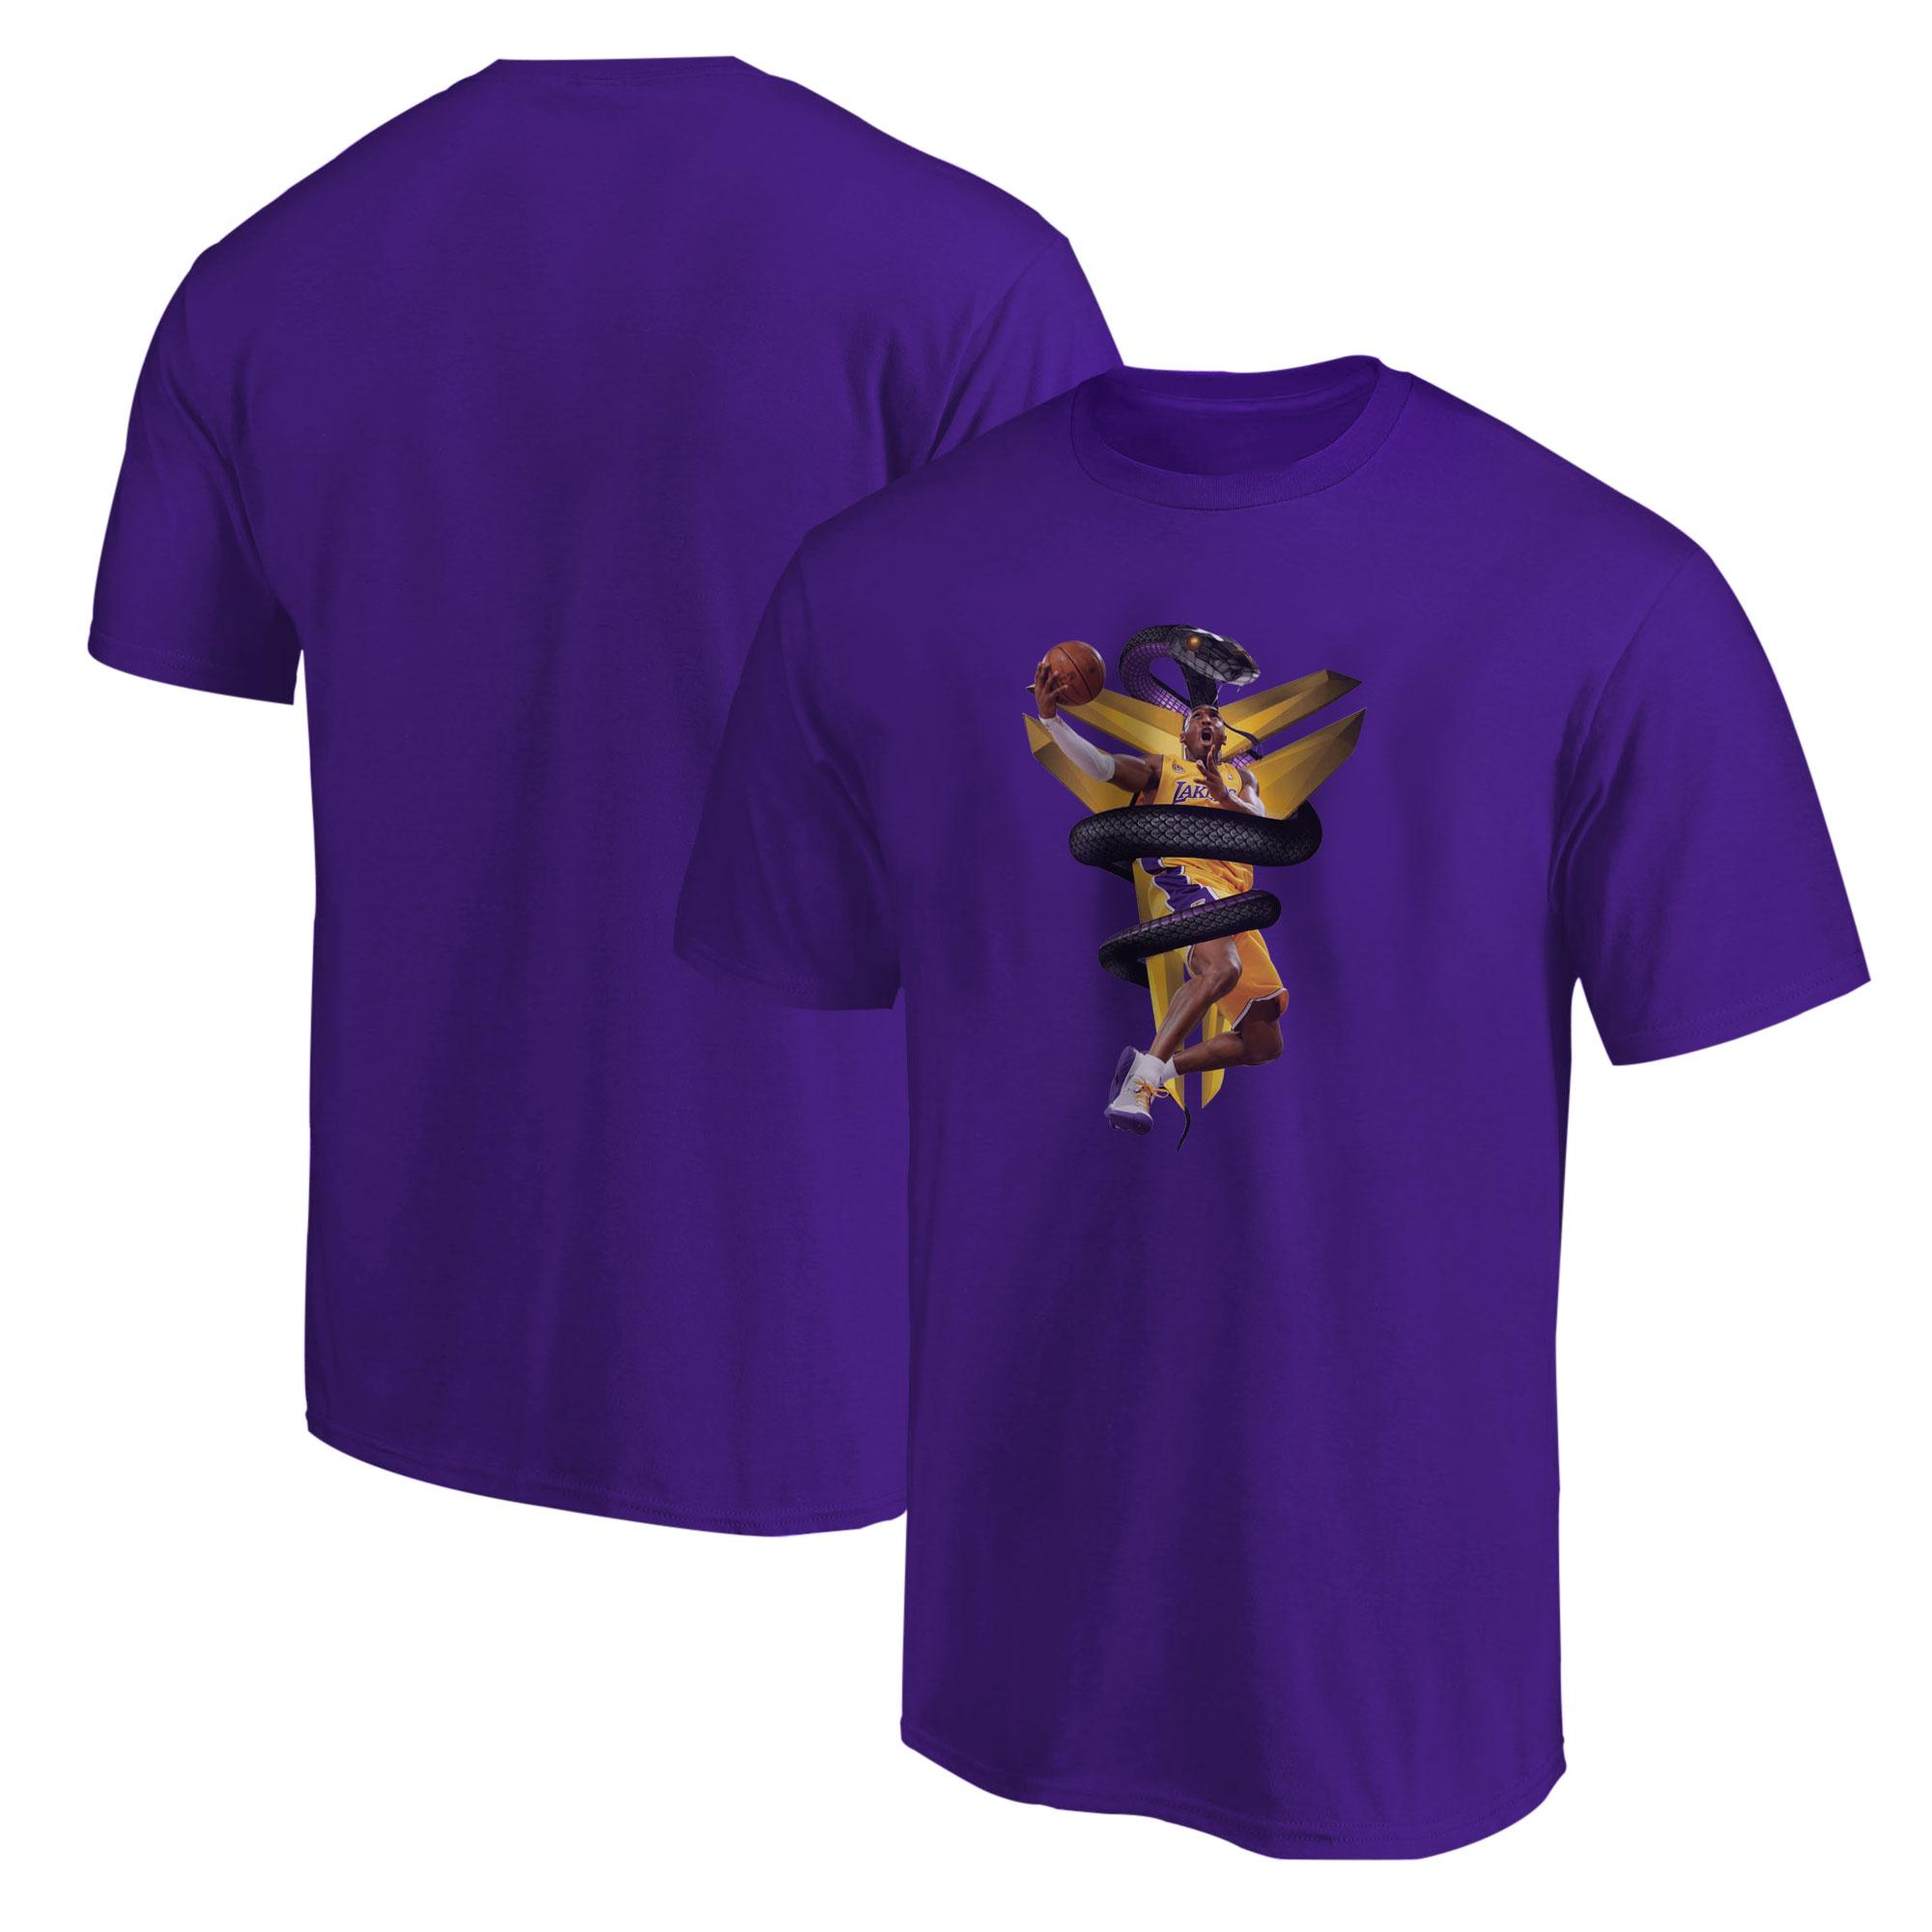 Kobe Bryant Tshirt (TSH-PRP-NP-133-PLYR-LAL-KOBE.MAMBA)